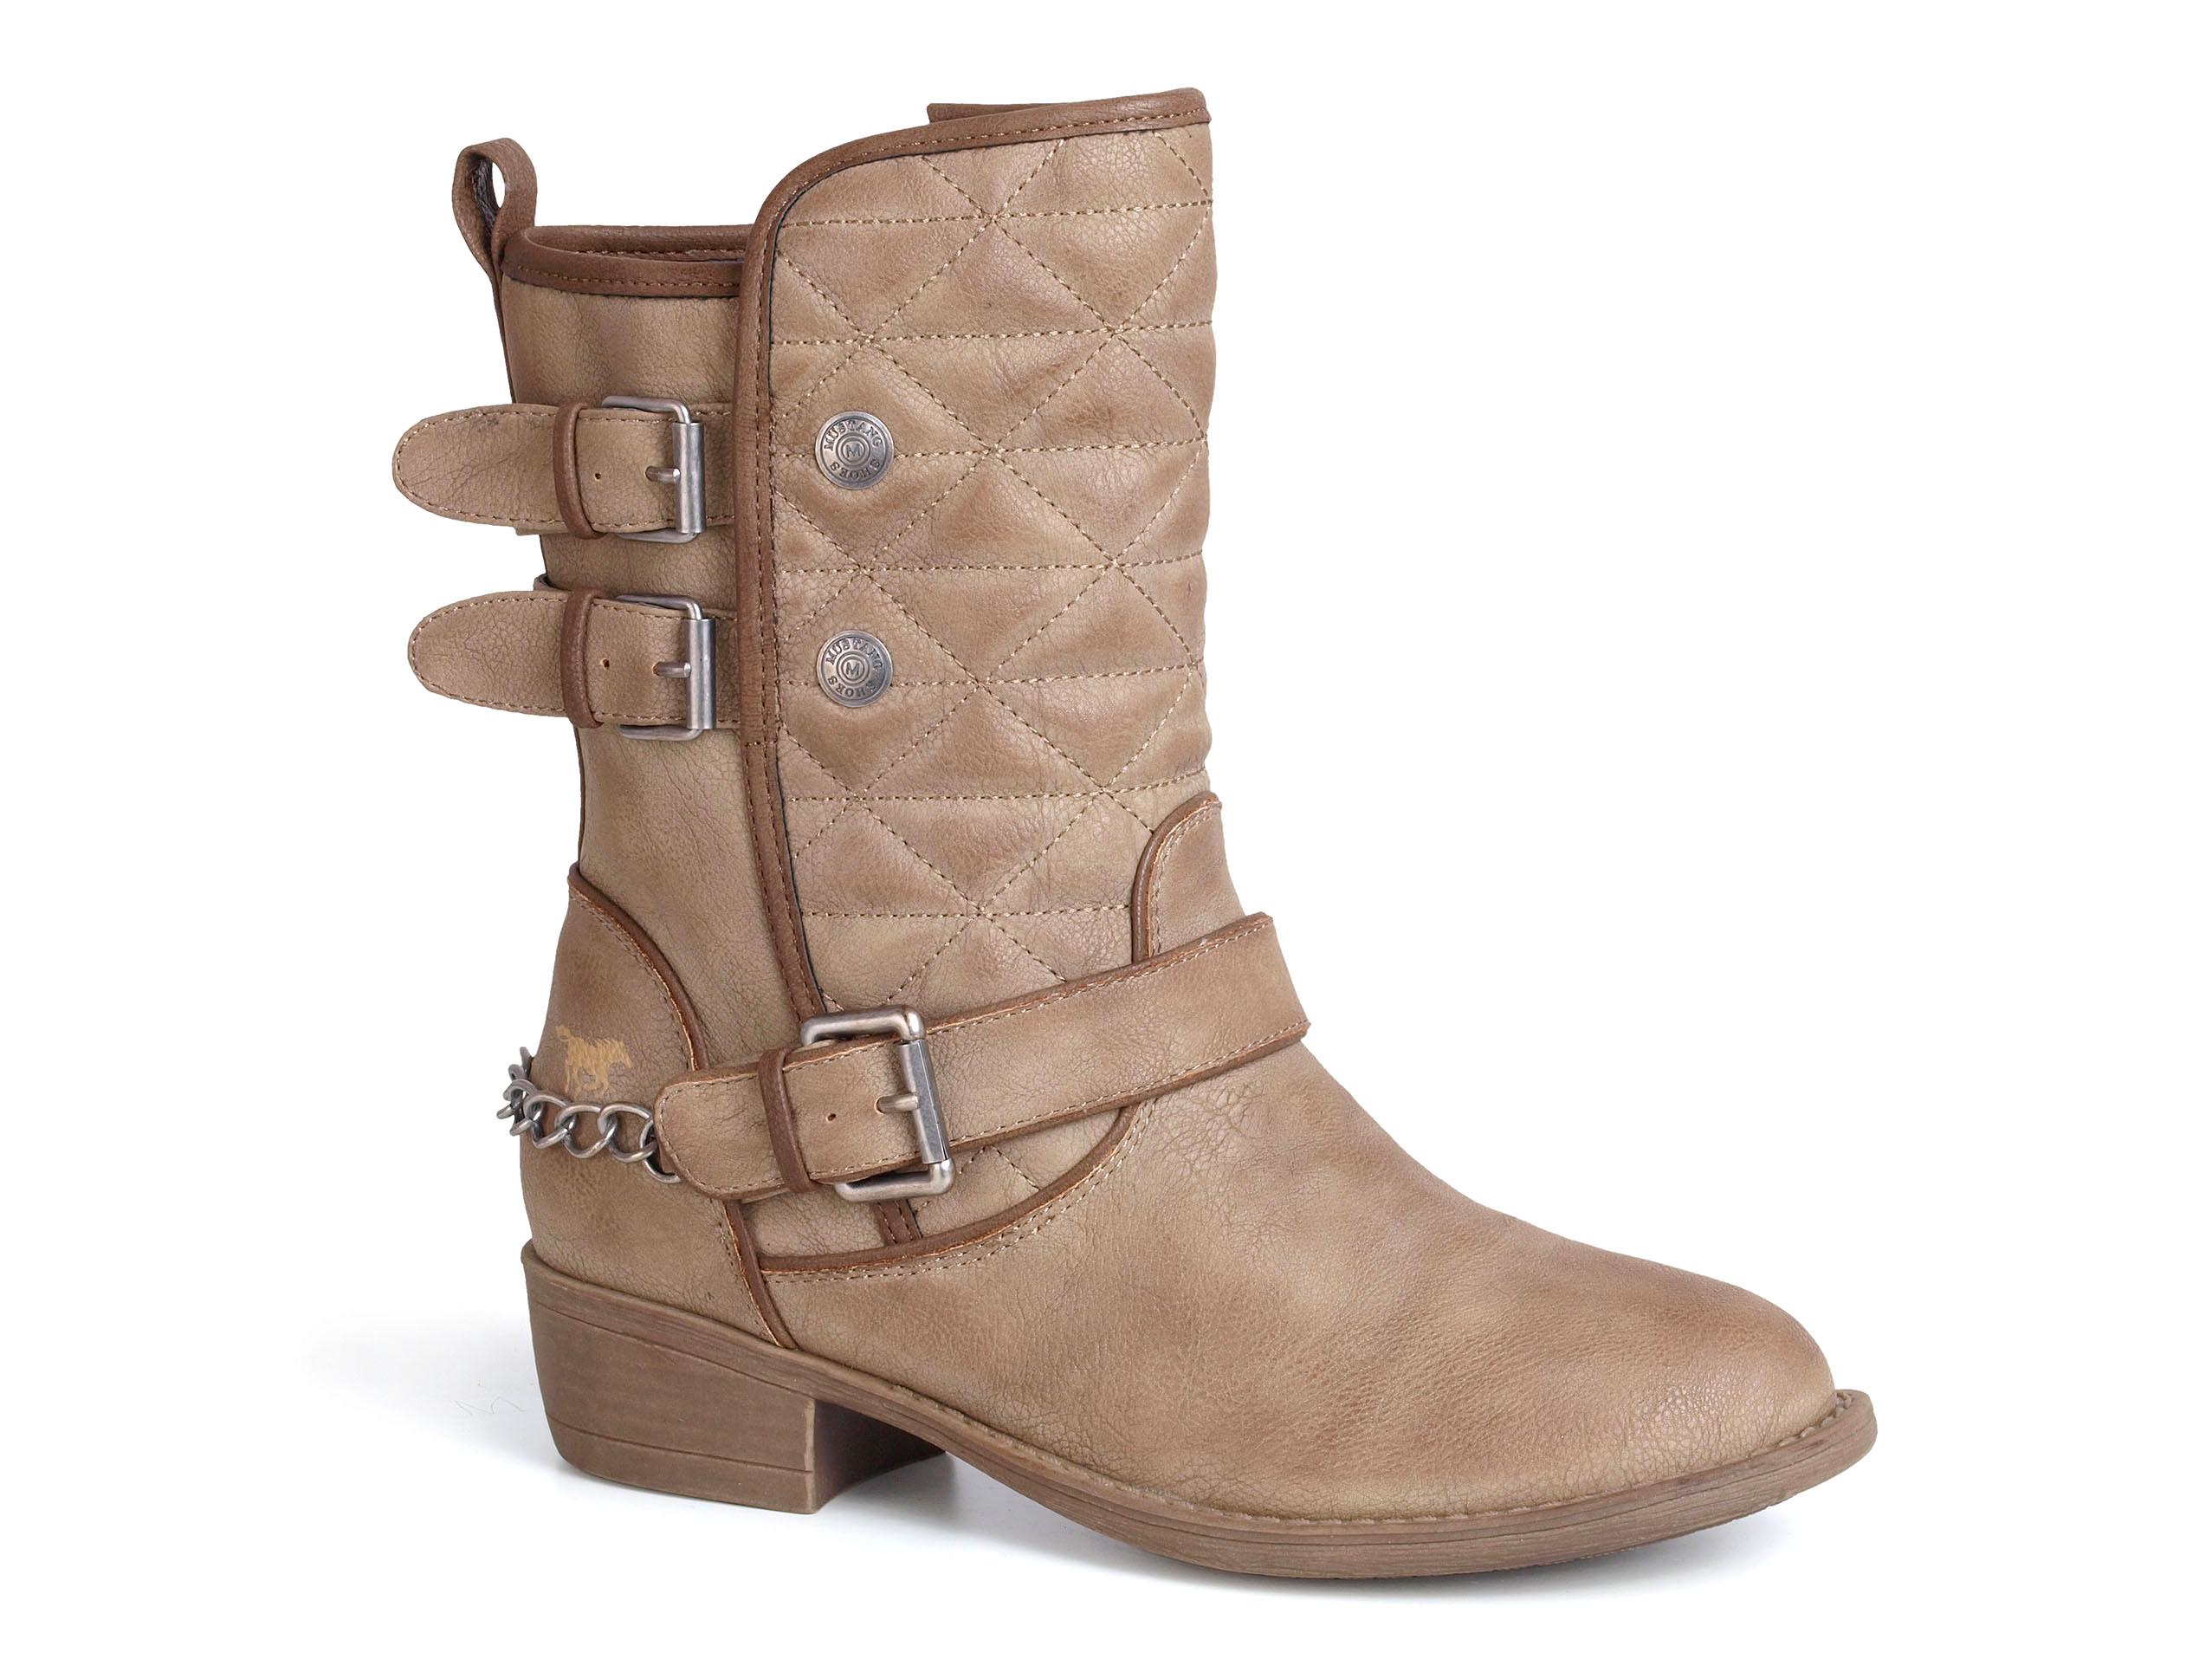 6e5d141d4dc33 Kozaki damskie MUSTANG shoes 35C-006. 35C006 kopia.jpg